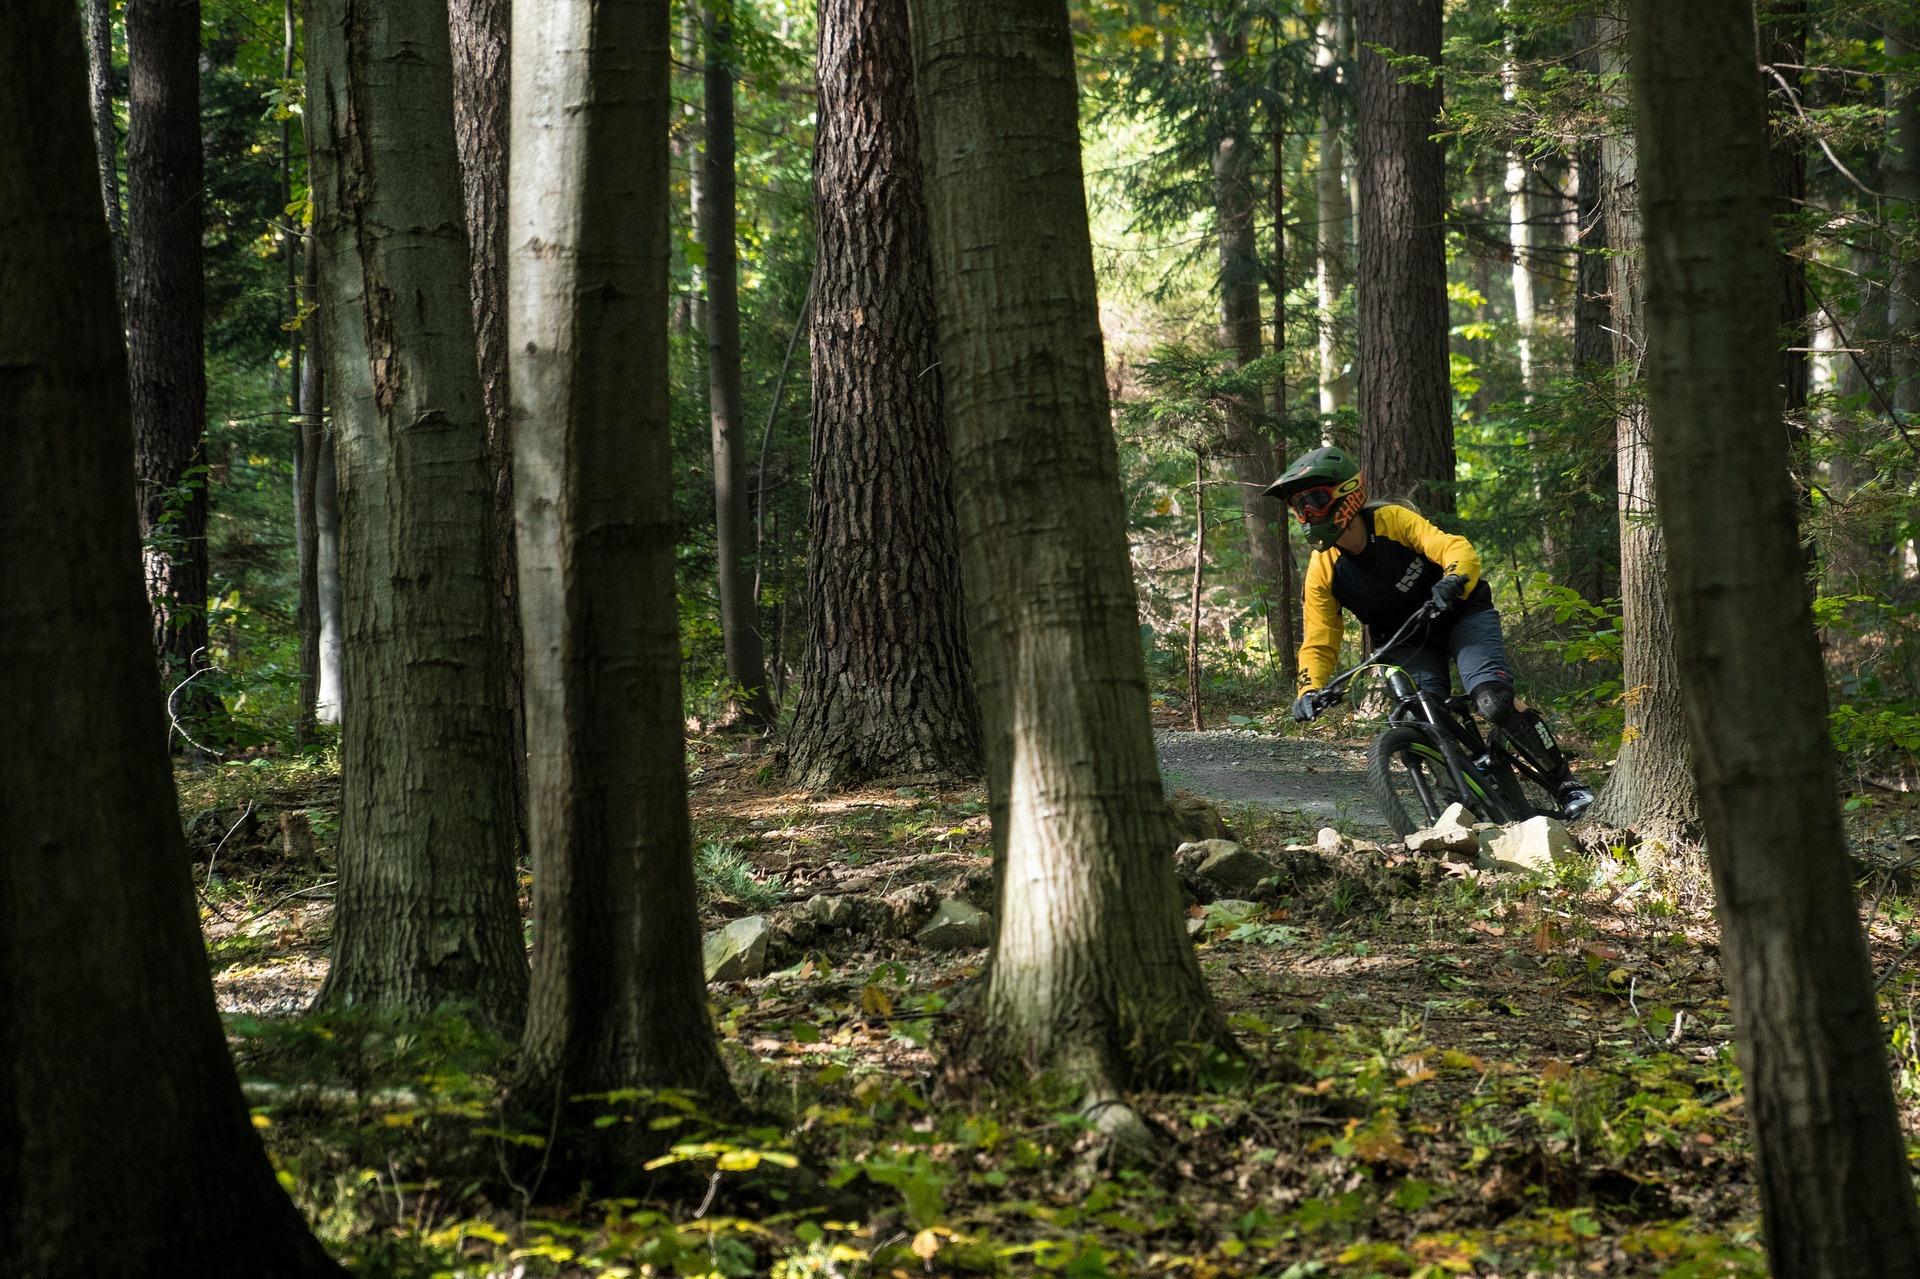 Mountainbike - Hjarbæk Fjord Camping